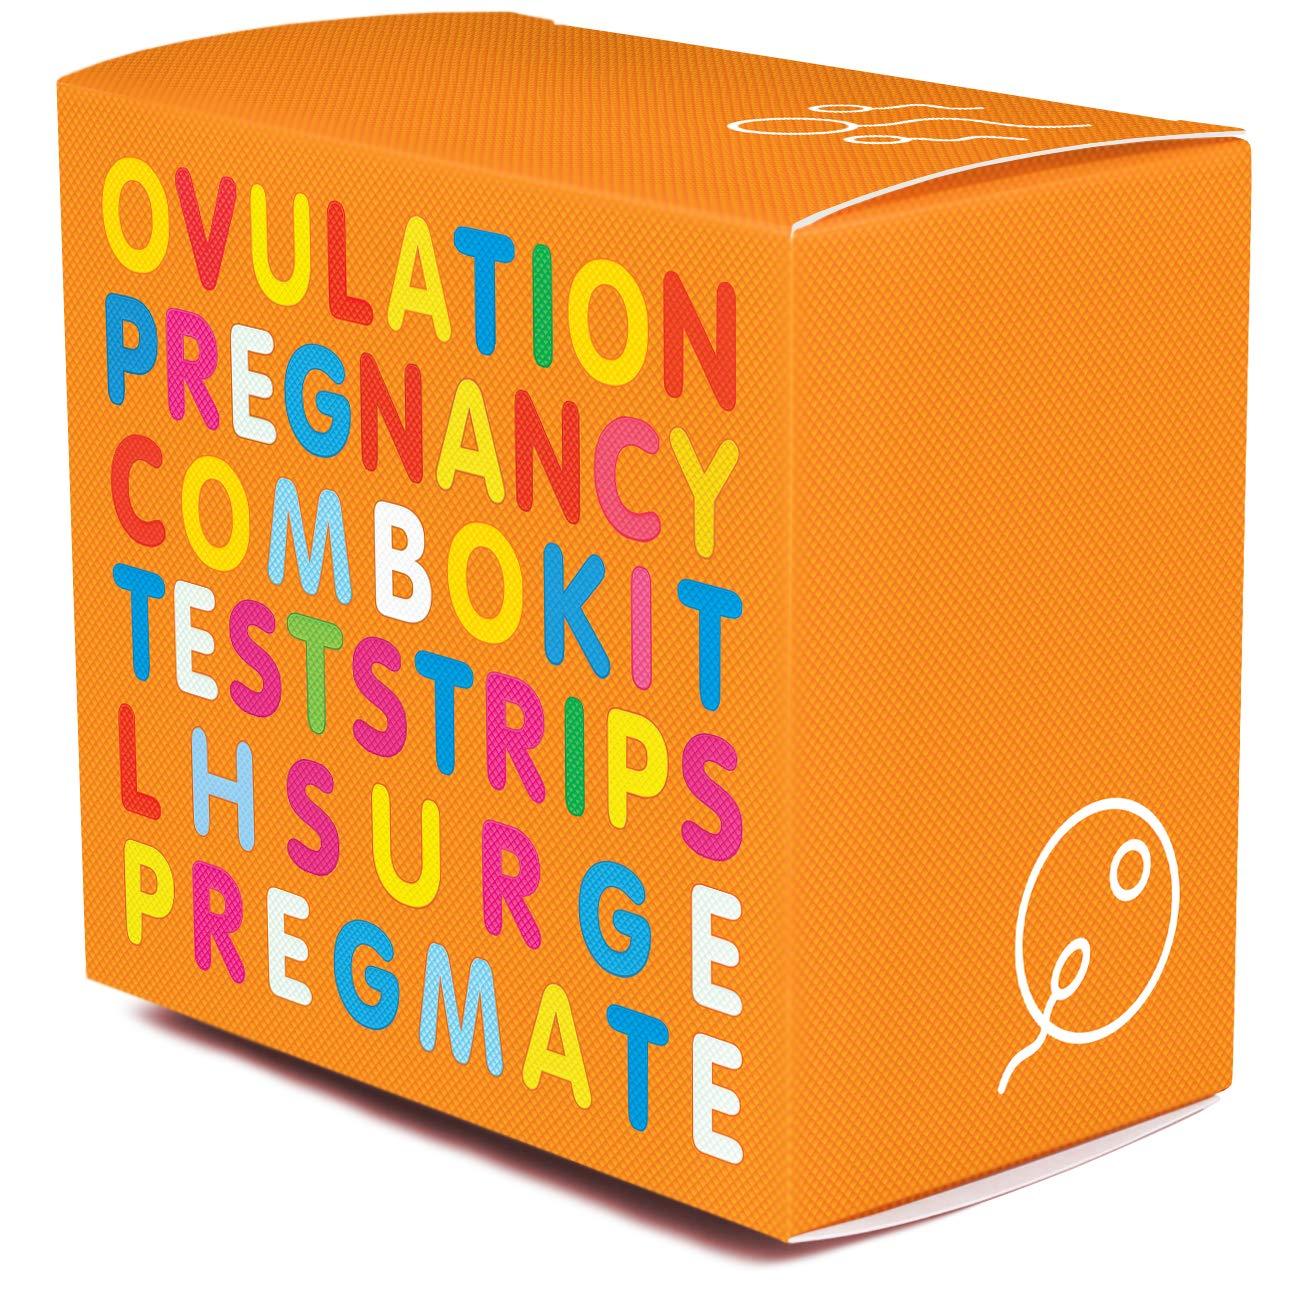 PREGMATE 50 Ovulation and 20 Pregnancy Test Strips Predictor Kit (50 LH + 20 HCG)